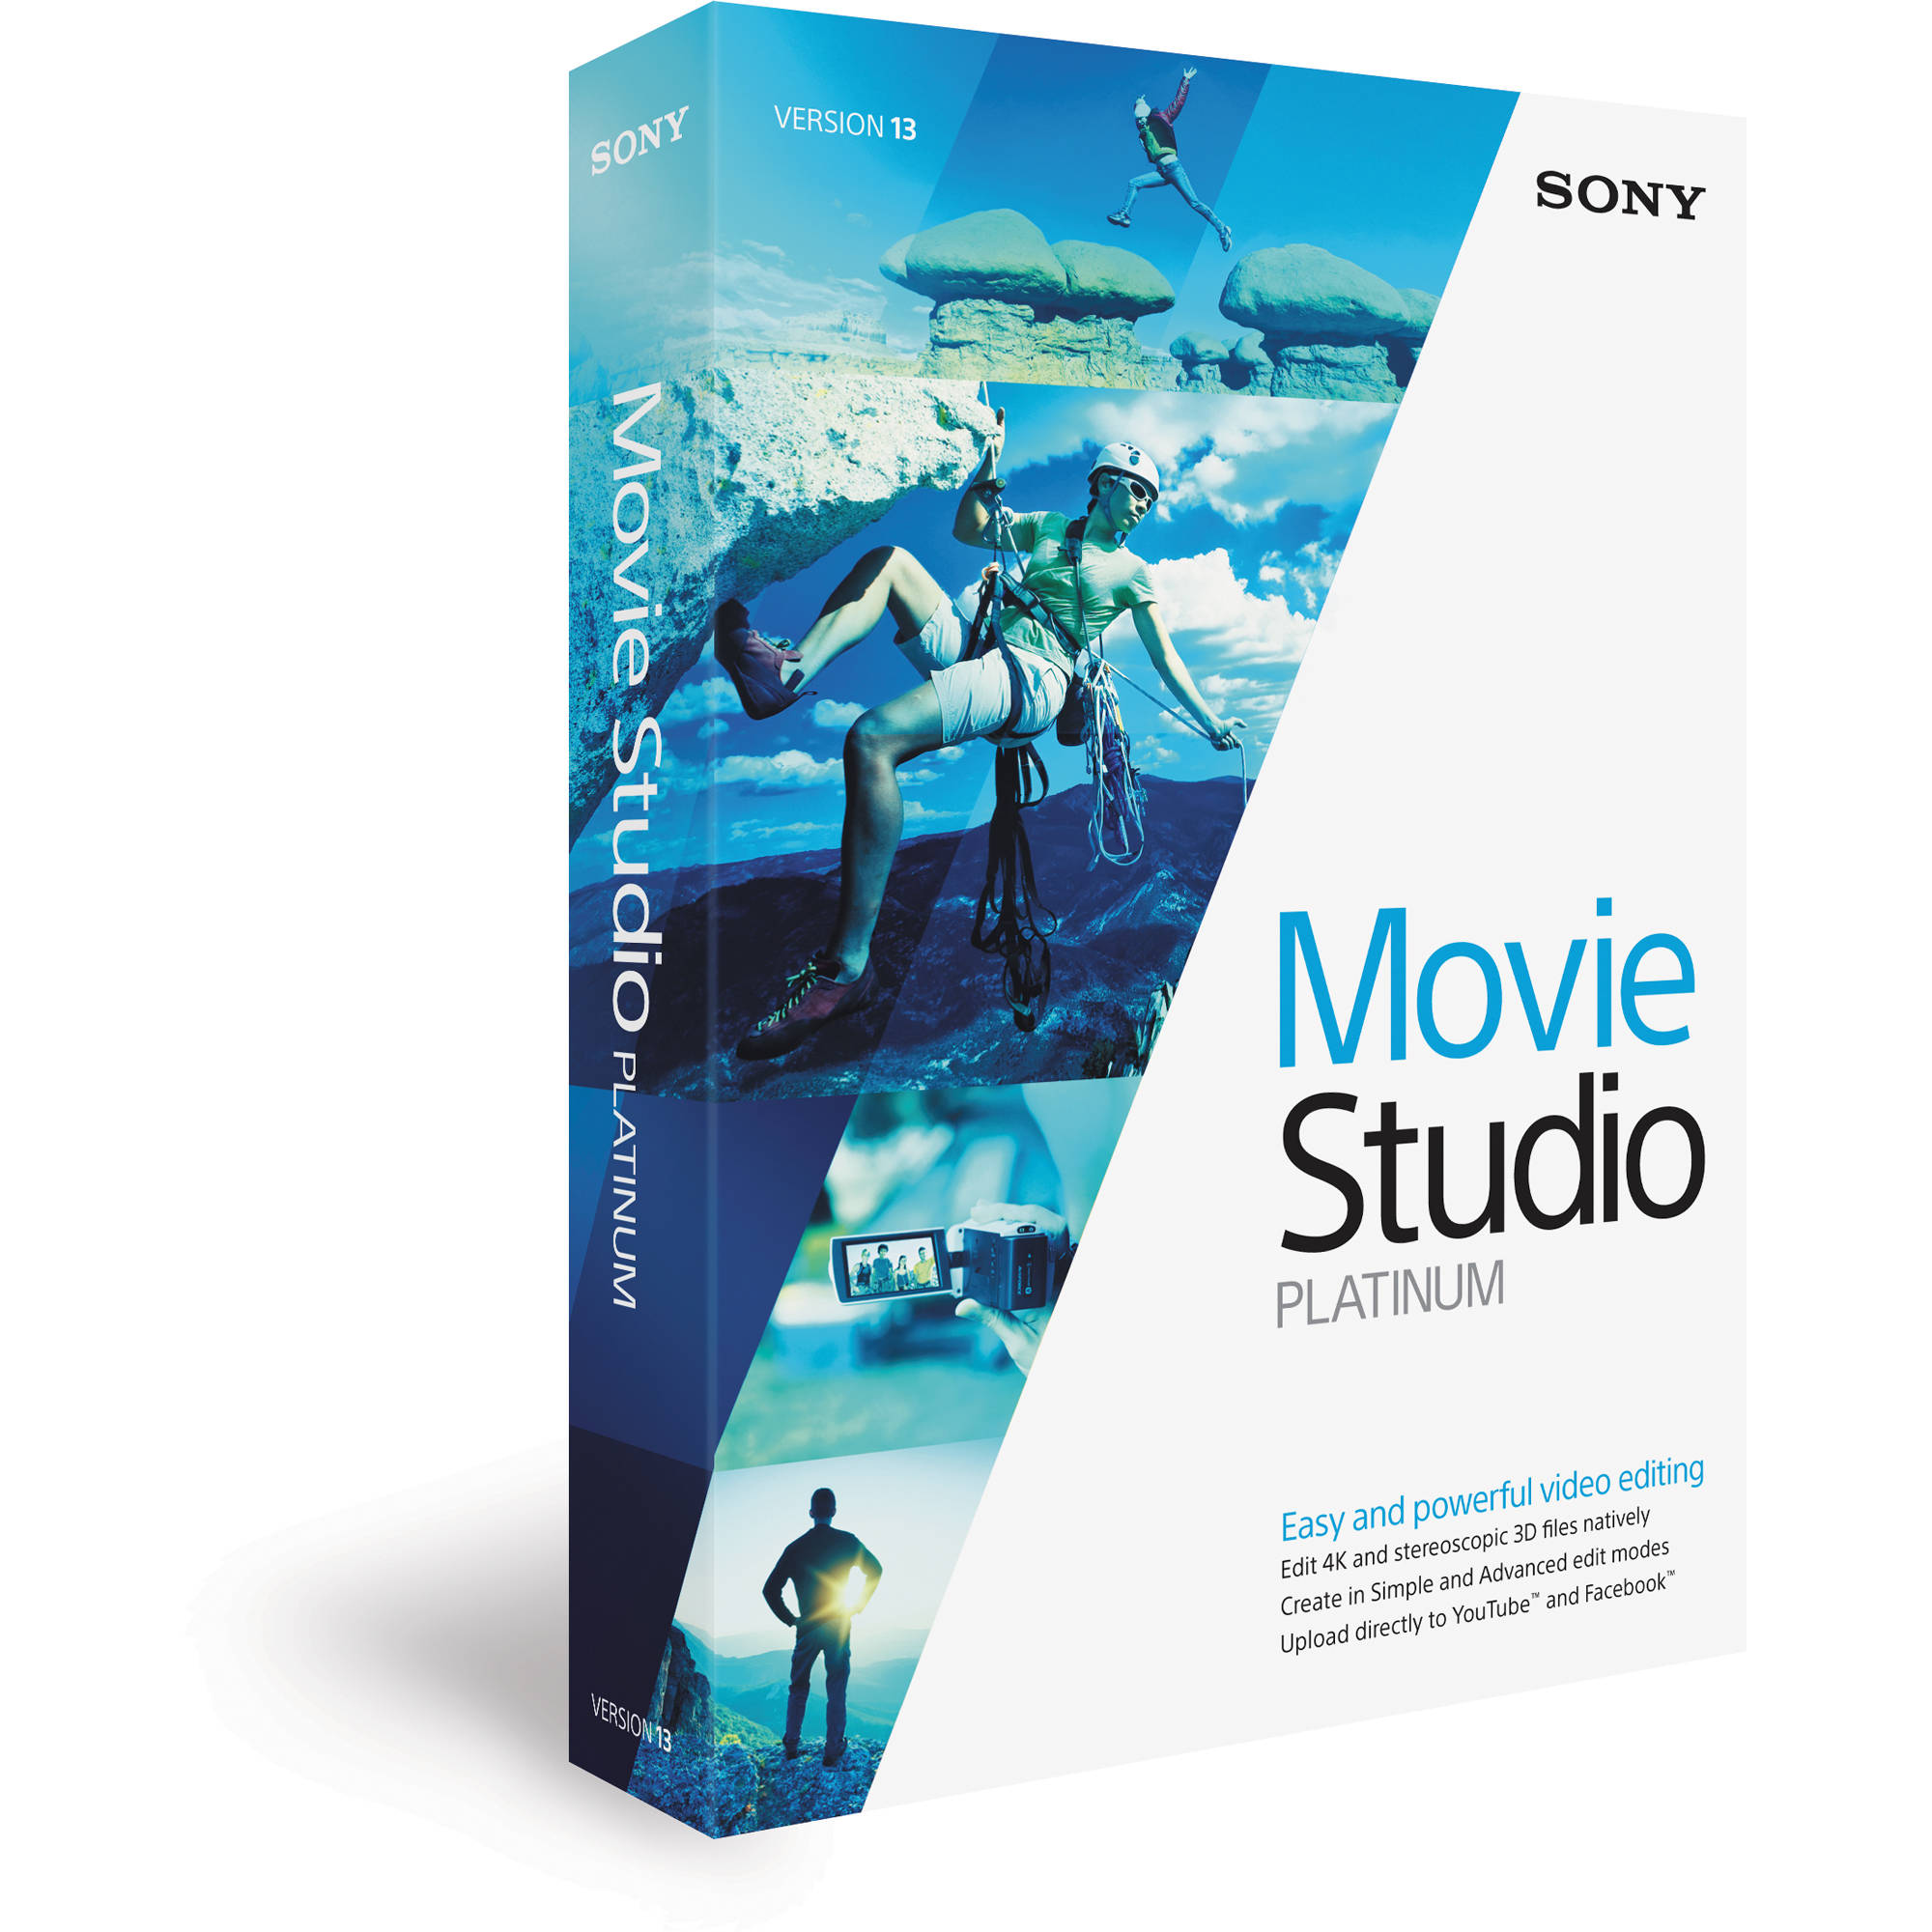 Sony movie studio platinum 13 buy fast